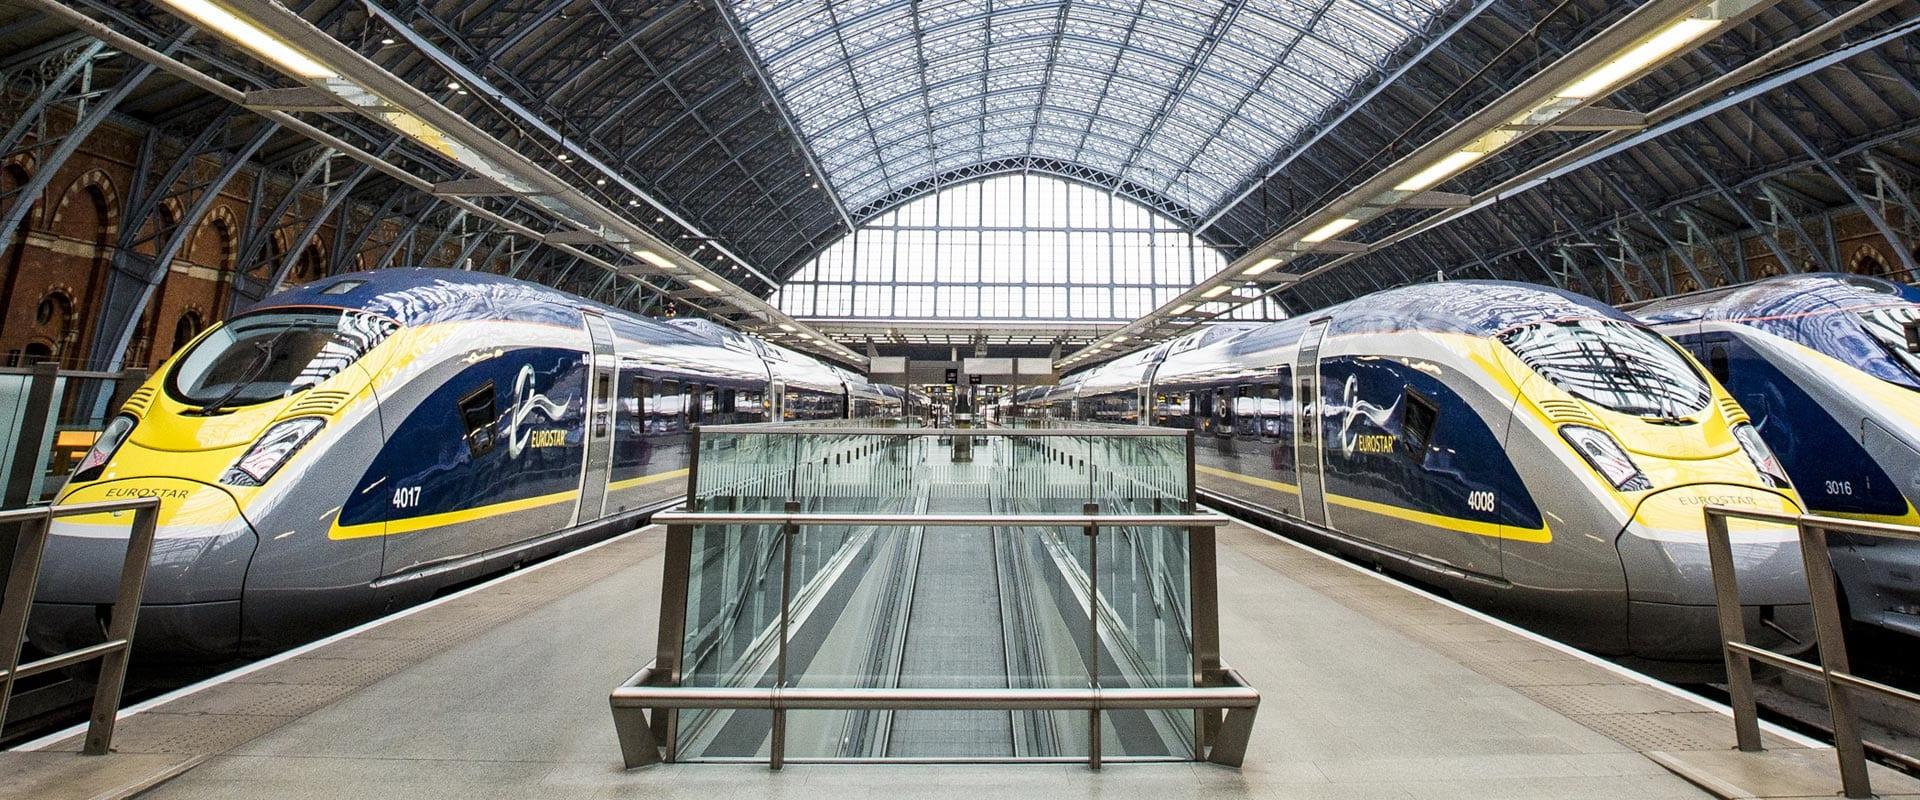 Trem de Paris para Londres